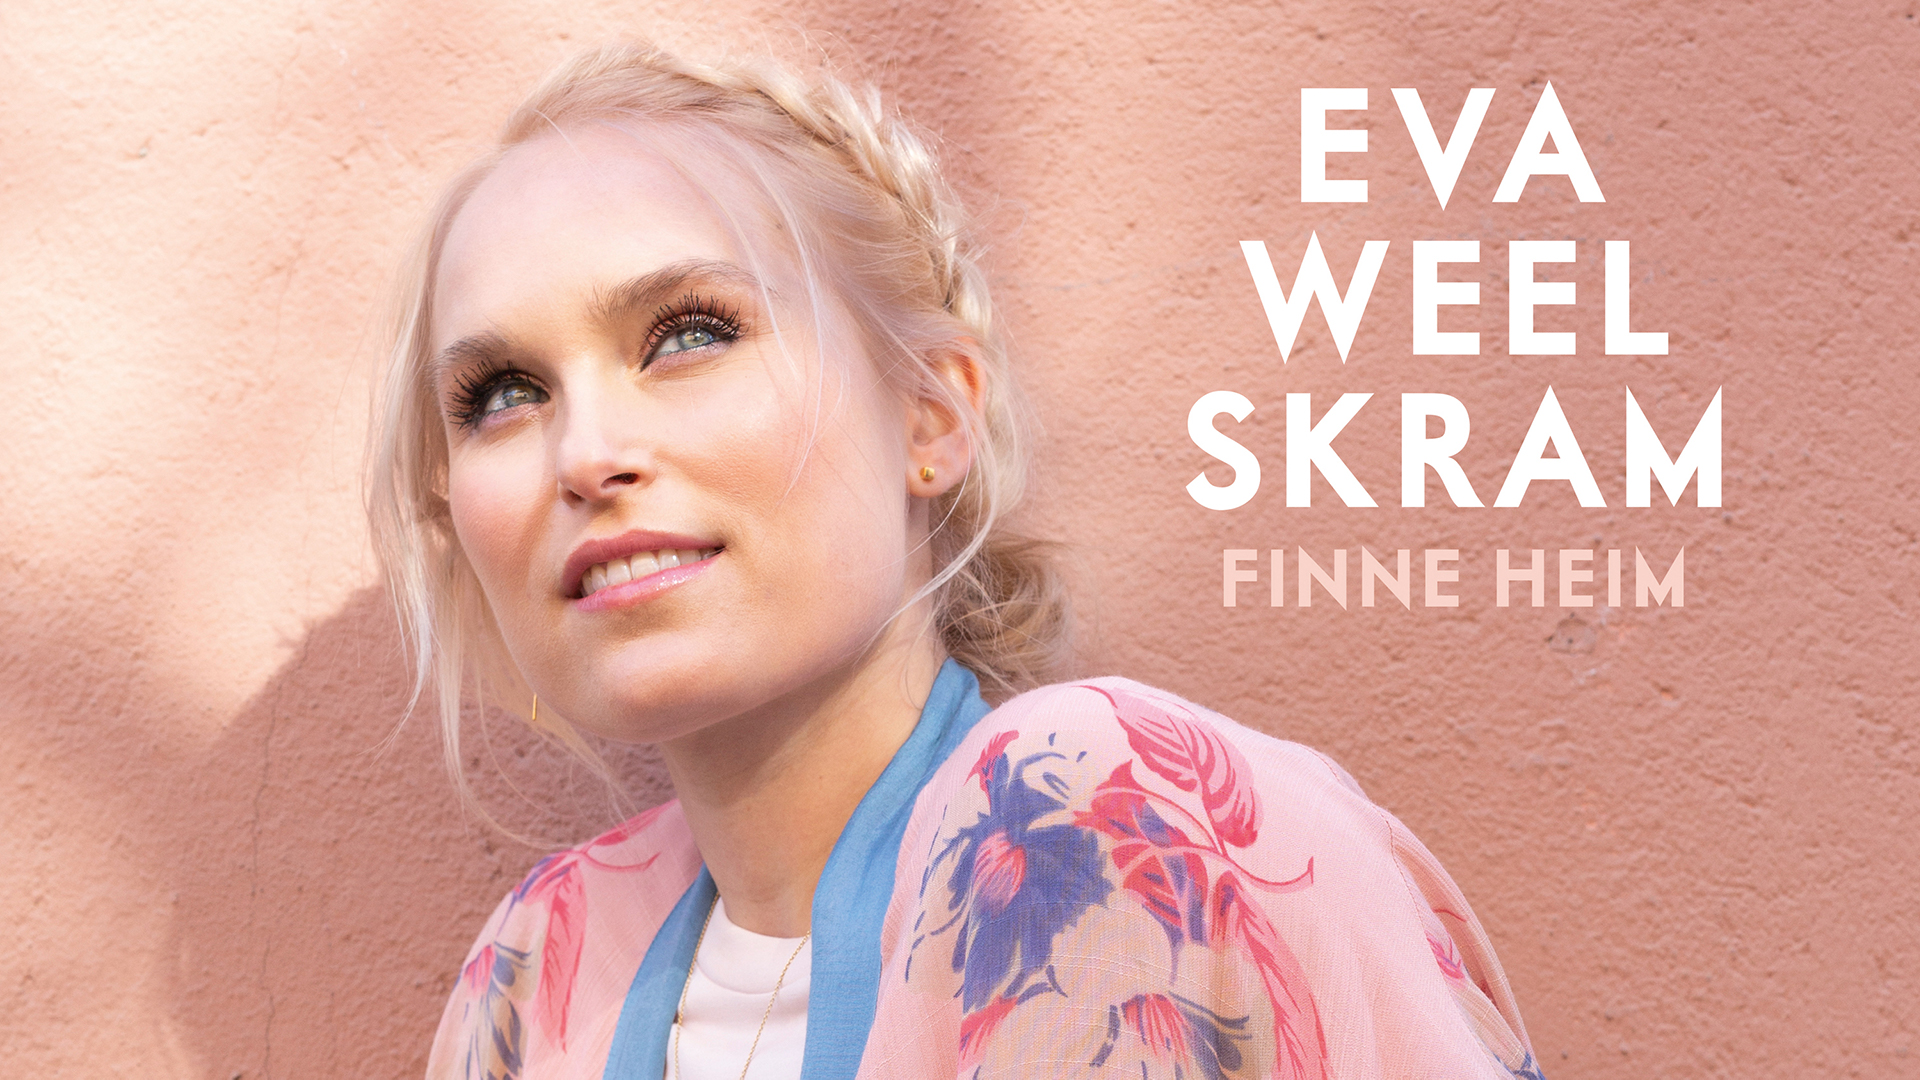 Eva Weel Skram Trio